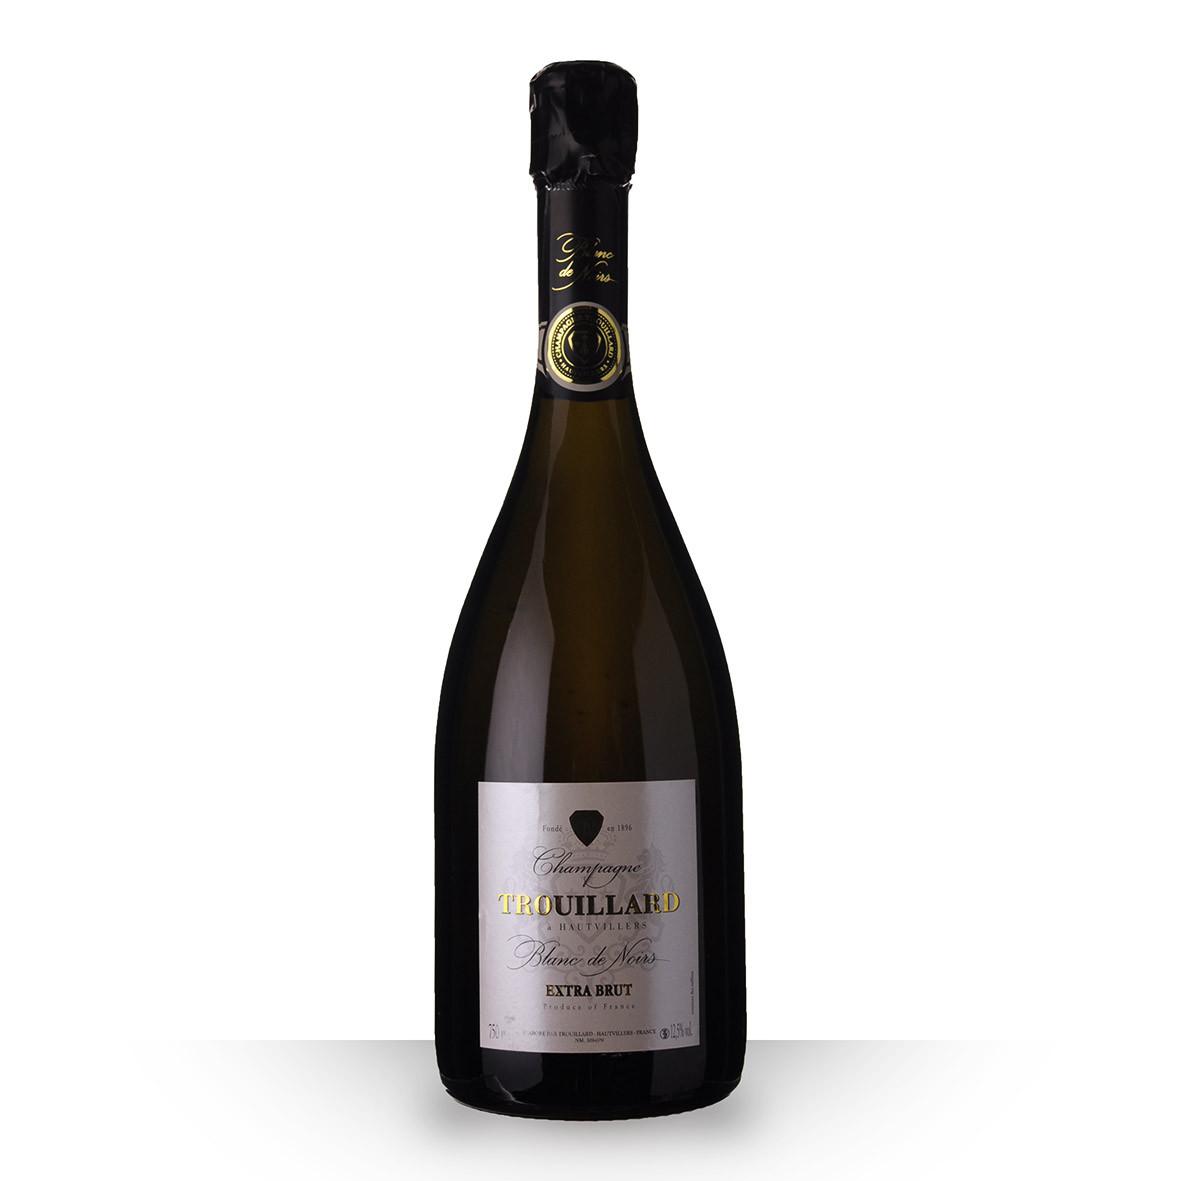 Champagne Trouillard Blanc de Noirs Extra Brut 75cl www.odyssee-vins.com